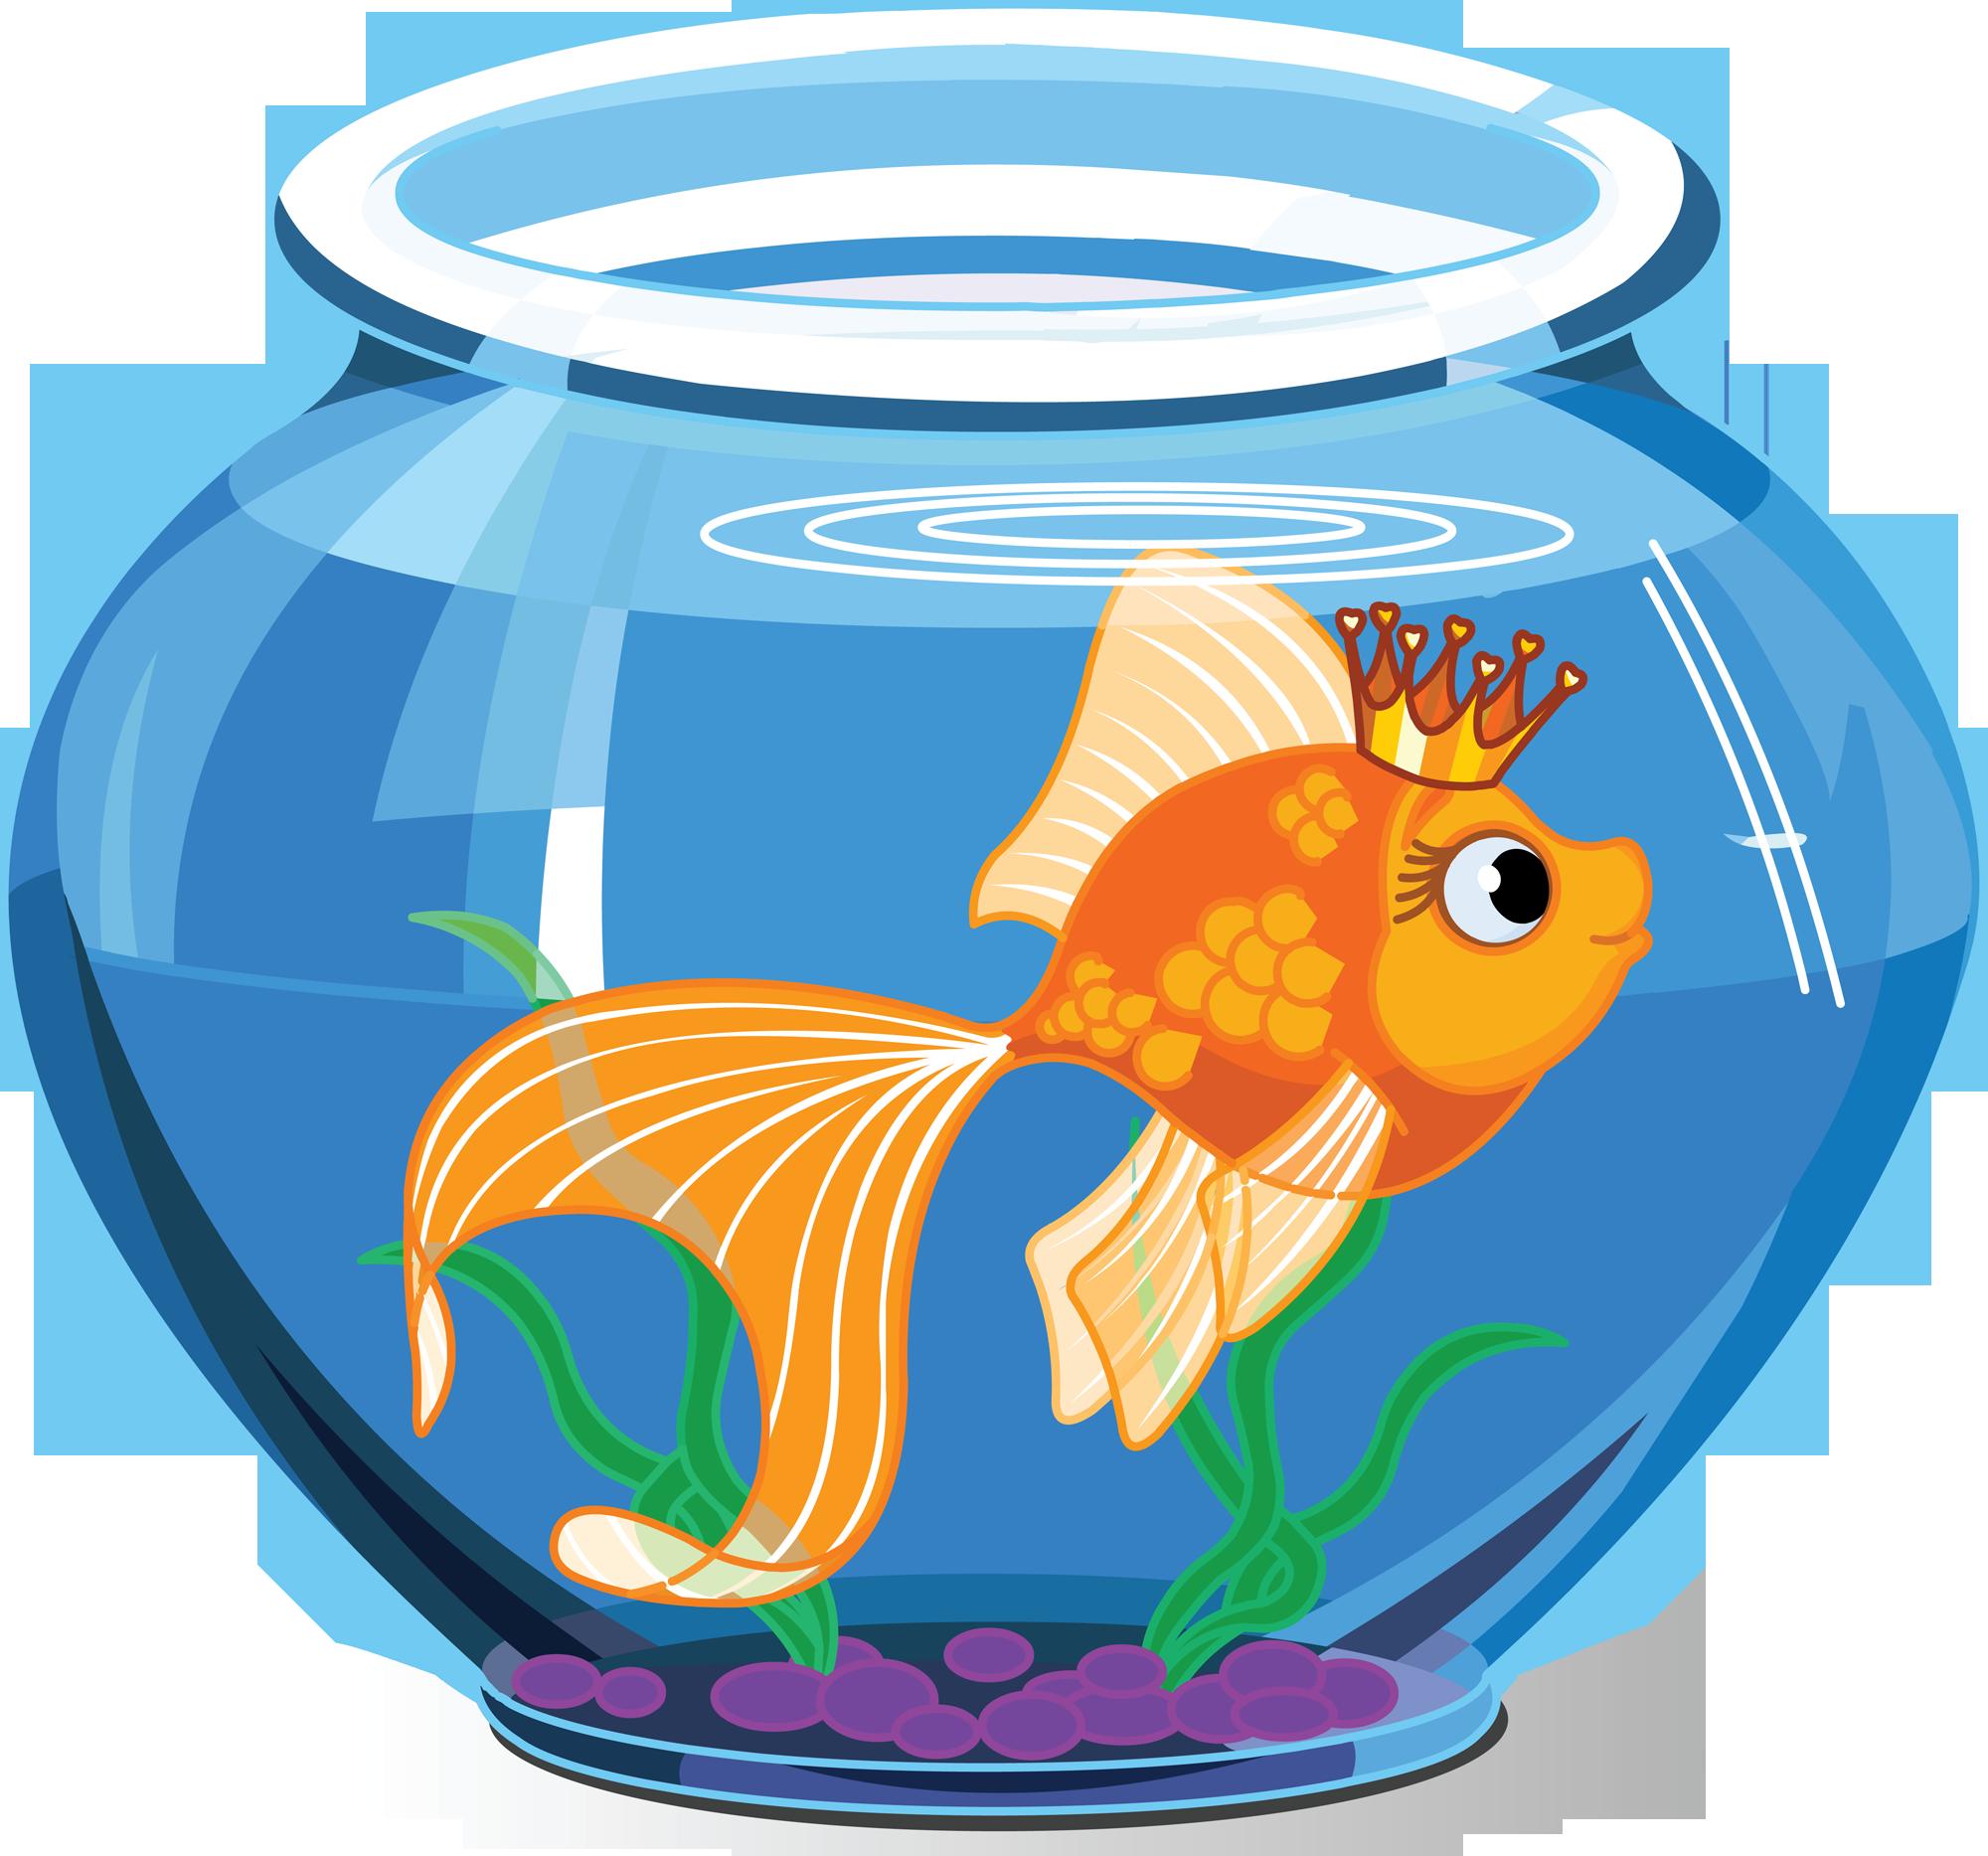 Aquarium fish images clipart graphic transparent stock Fish Tank Clipart | Free download best Fish Tank Clipart on ... graphic transparent stock